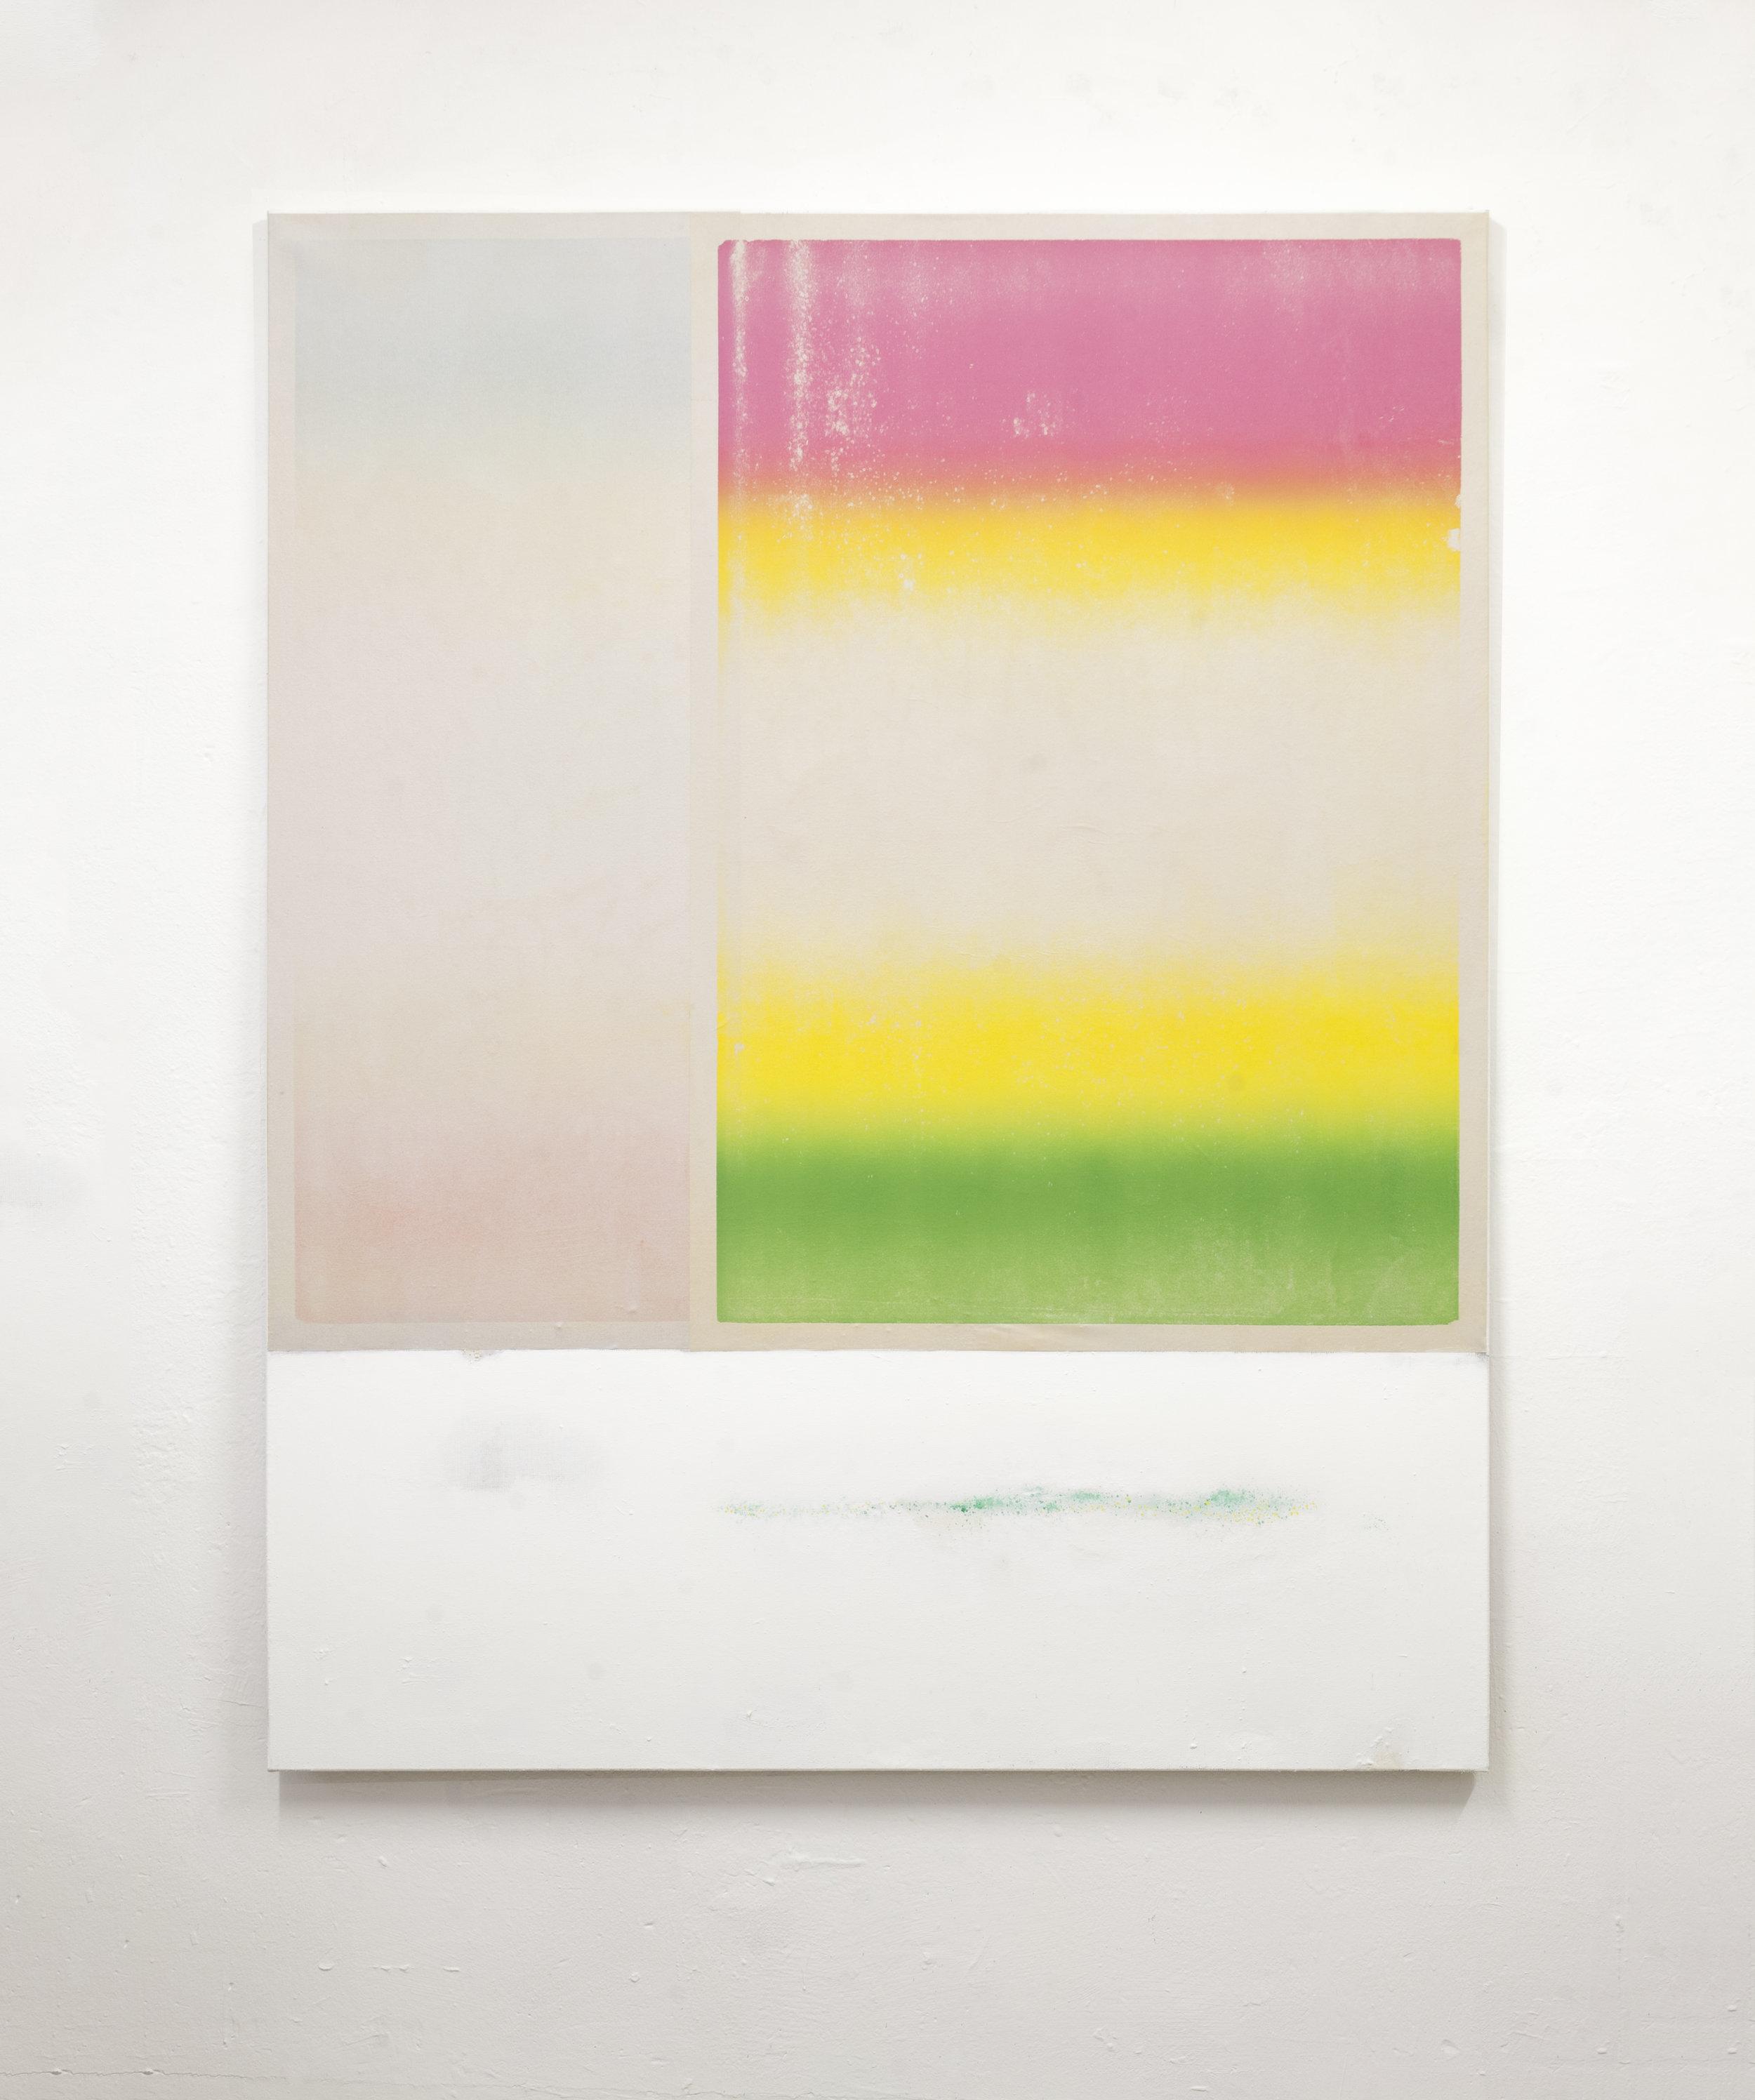 Sans titre 23, 2019, 57 x 45 in, 146 x 114 cm, 300 dpi copy.jpg